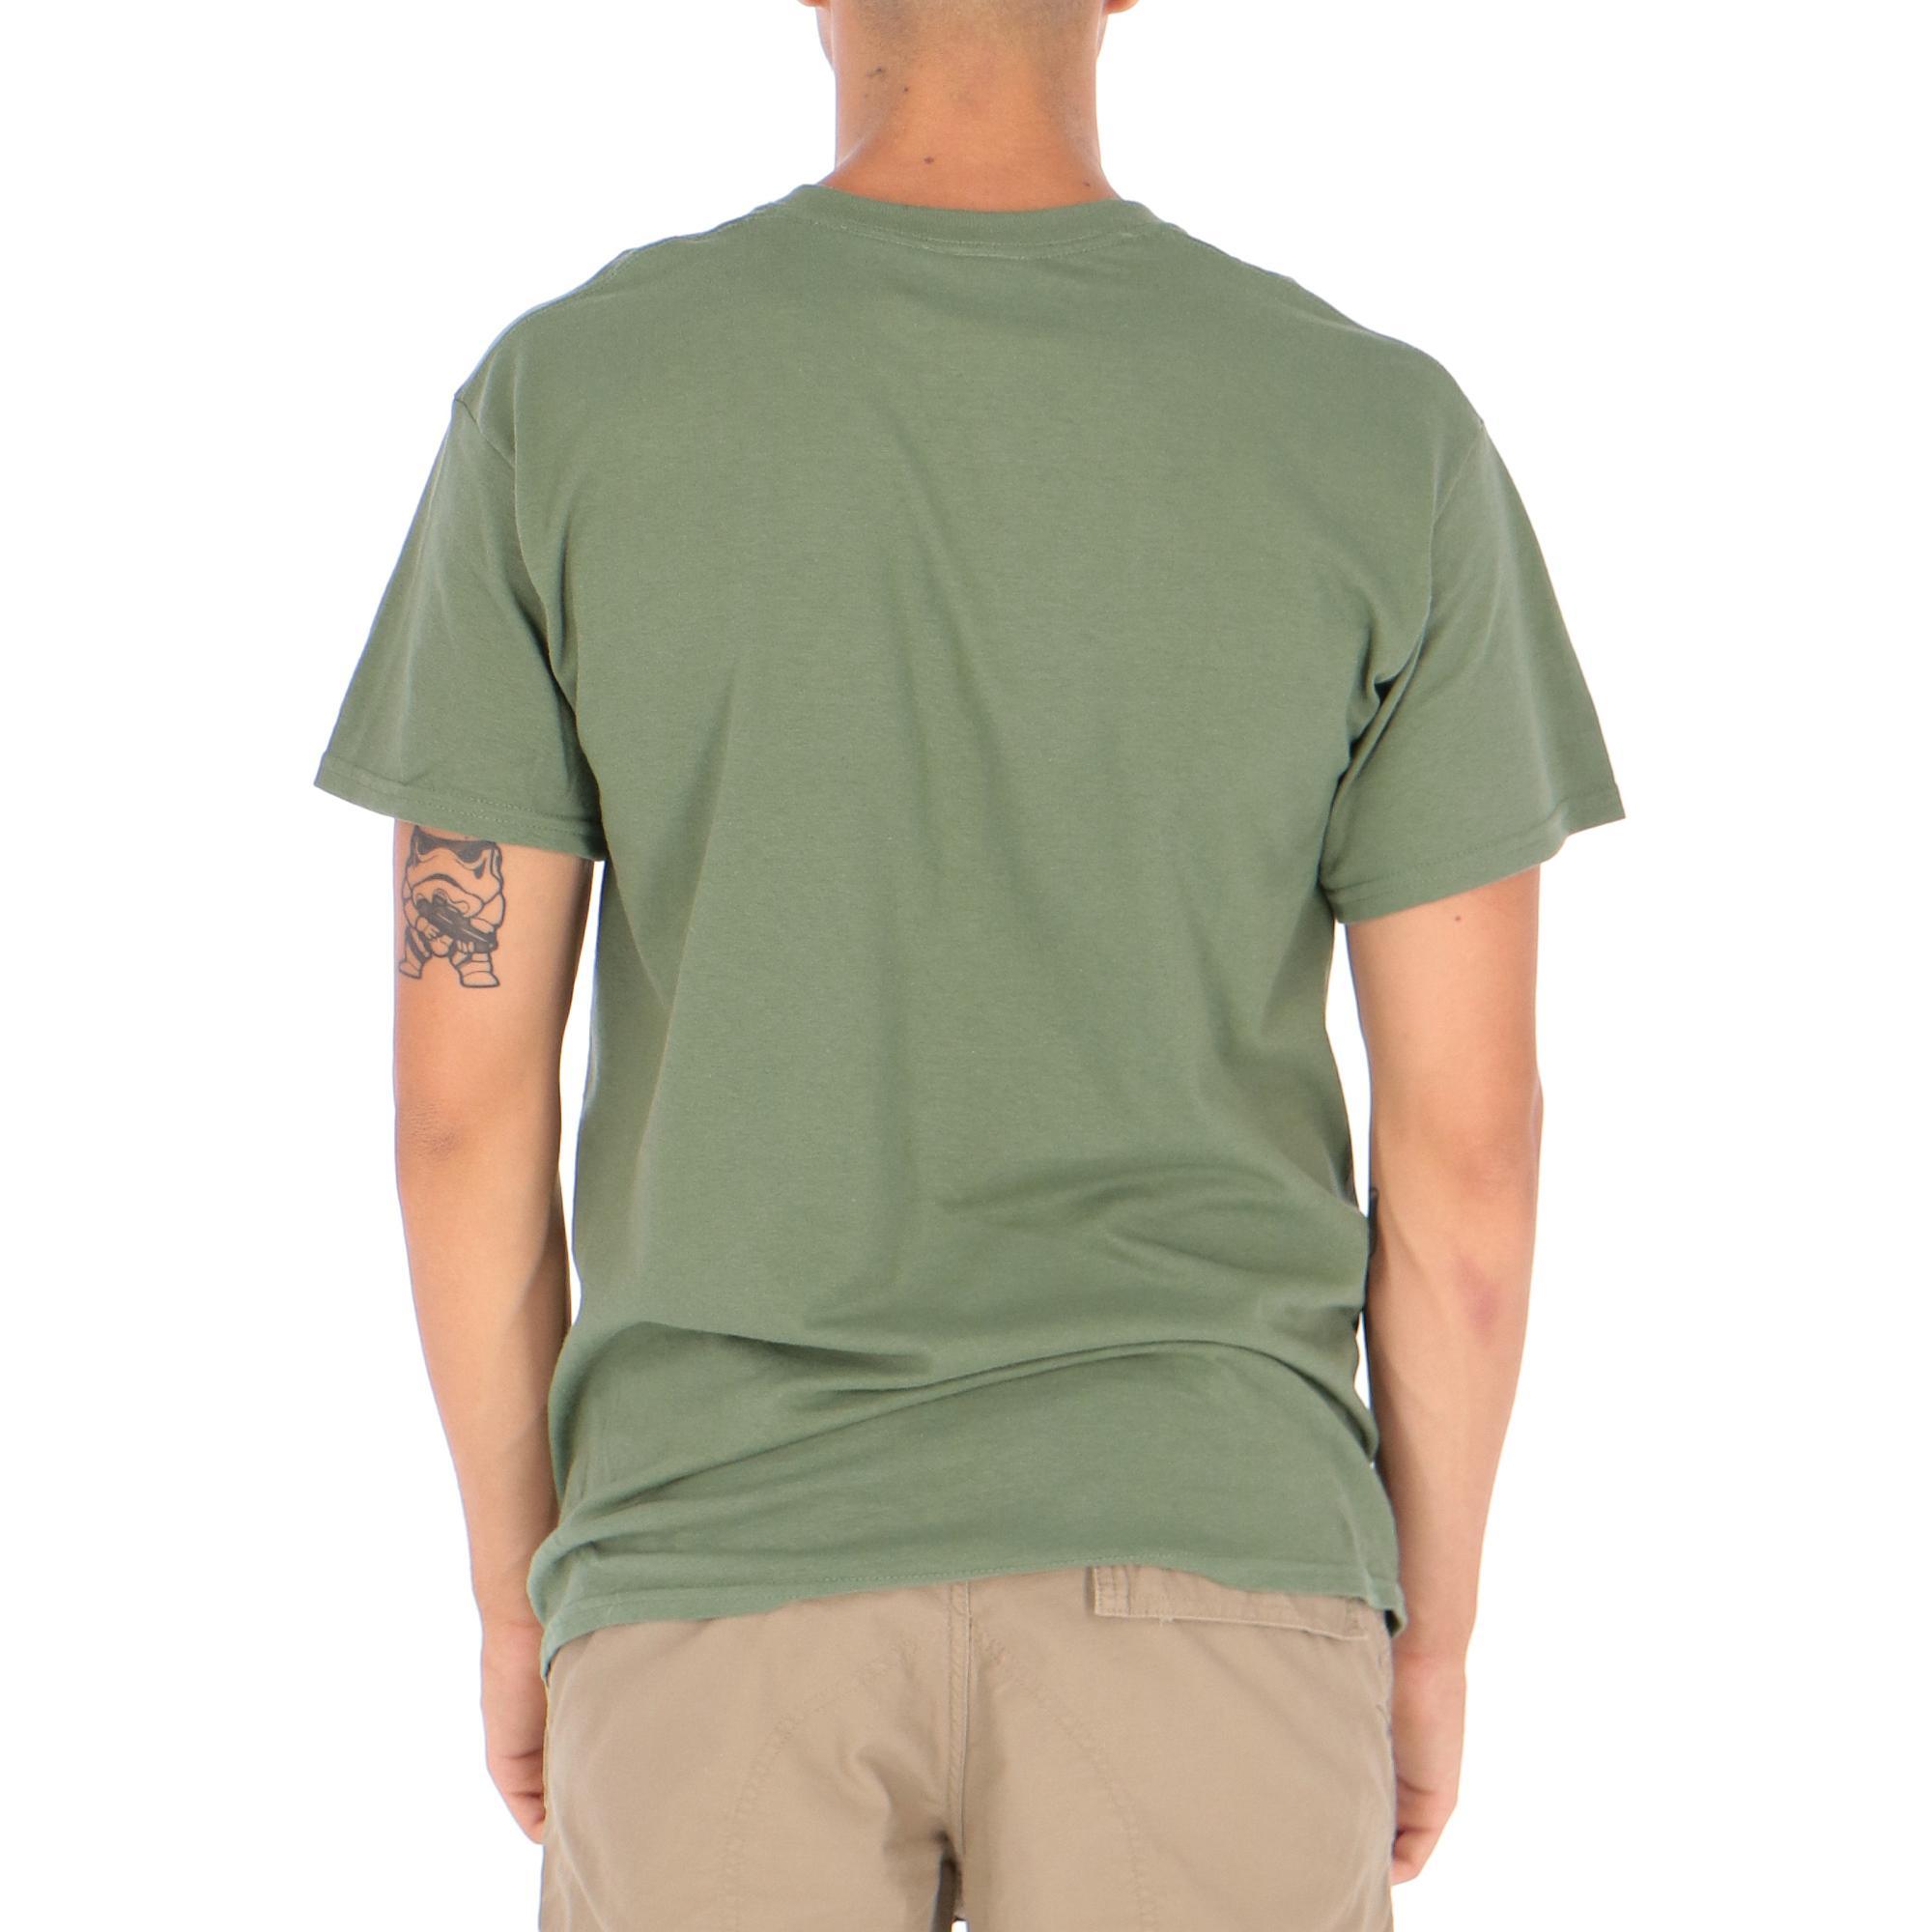 Thrasher Skatemag Tee<br/> Army green